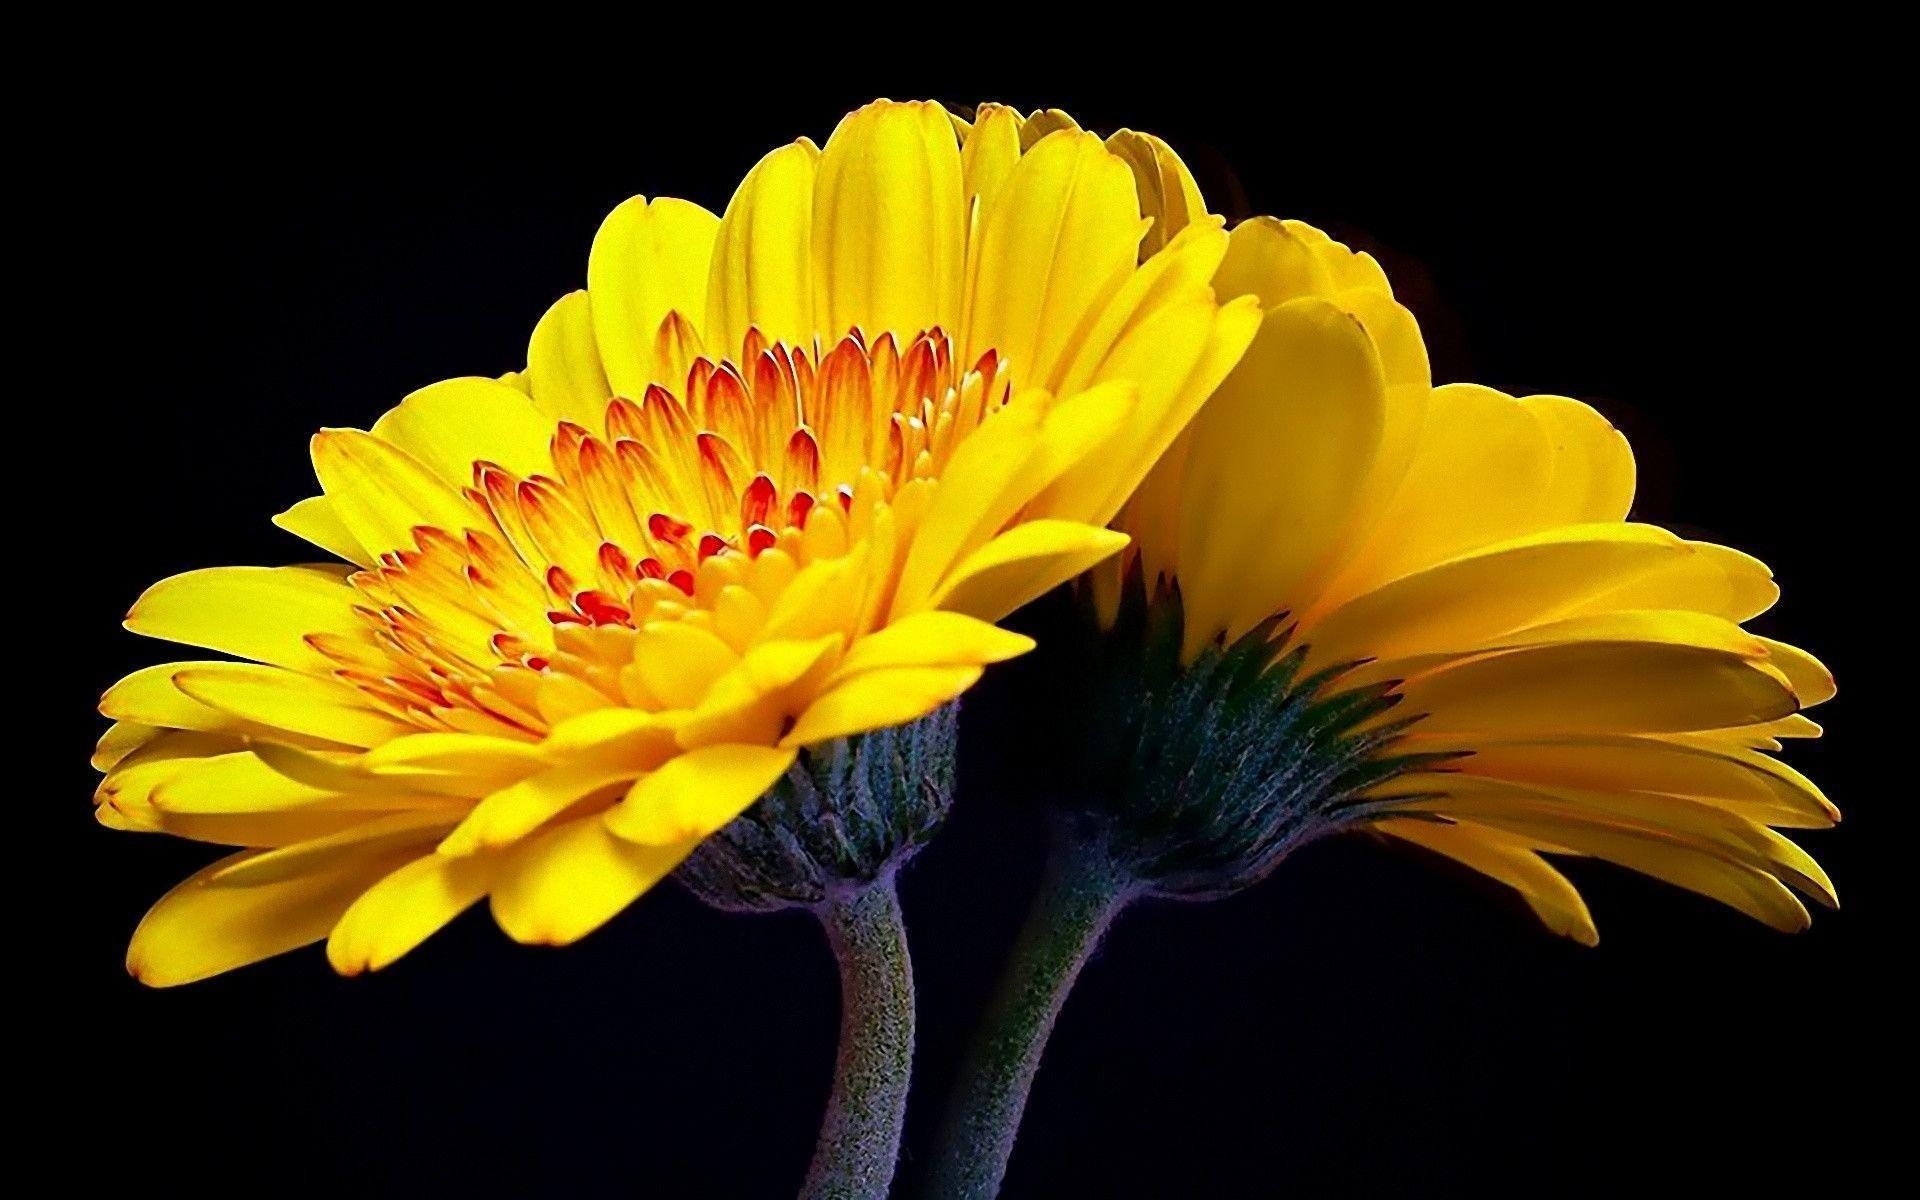 super nature Yellow Flowers Wallpaper